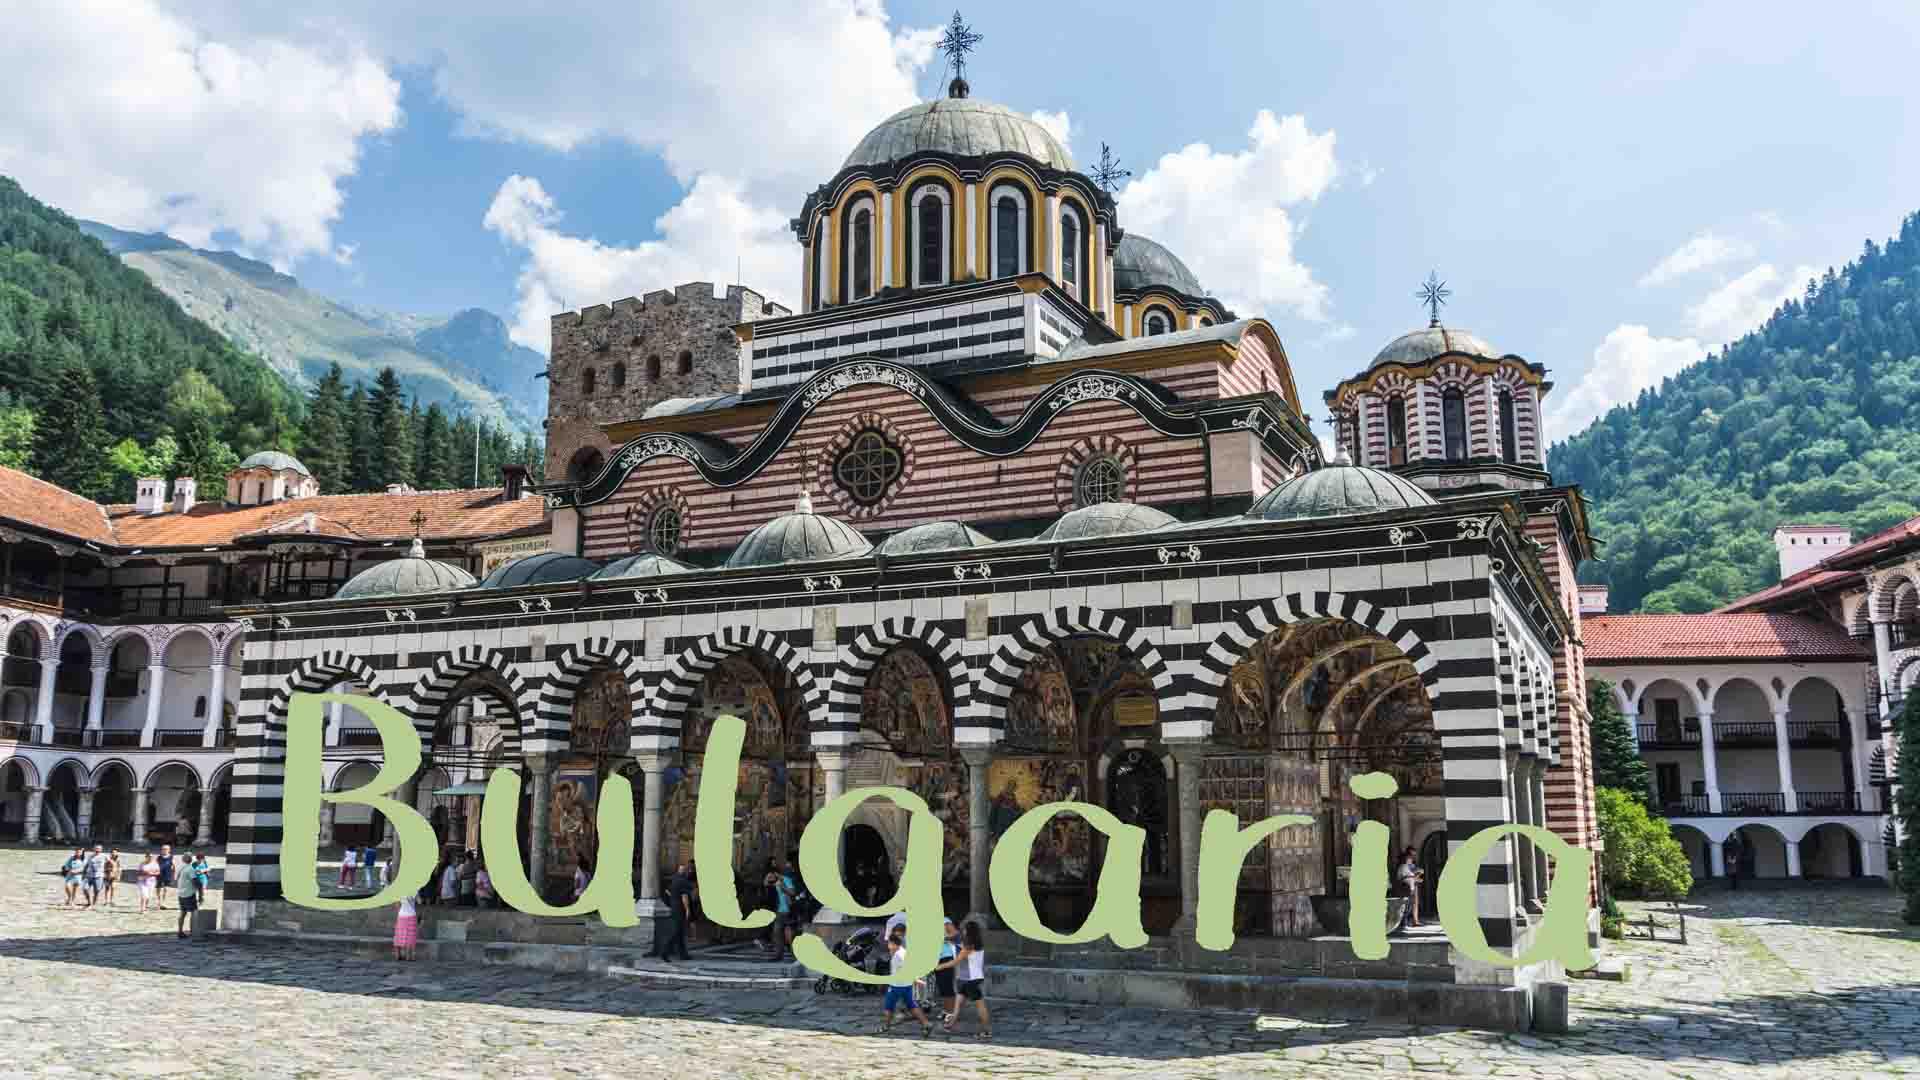 SerialHikers stop autostop world monde tour hitchhiking aventure adventure alternative travel voyage sans avion no fly Bulgarie bulgaria rila monastère monastry